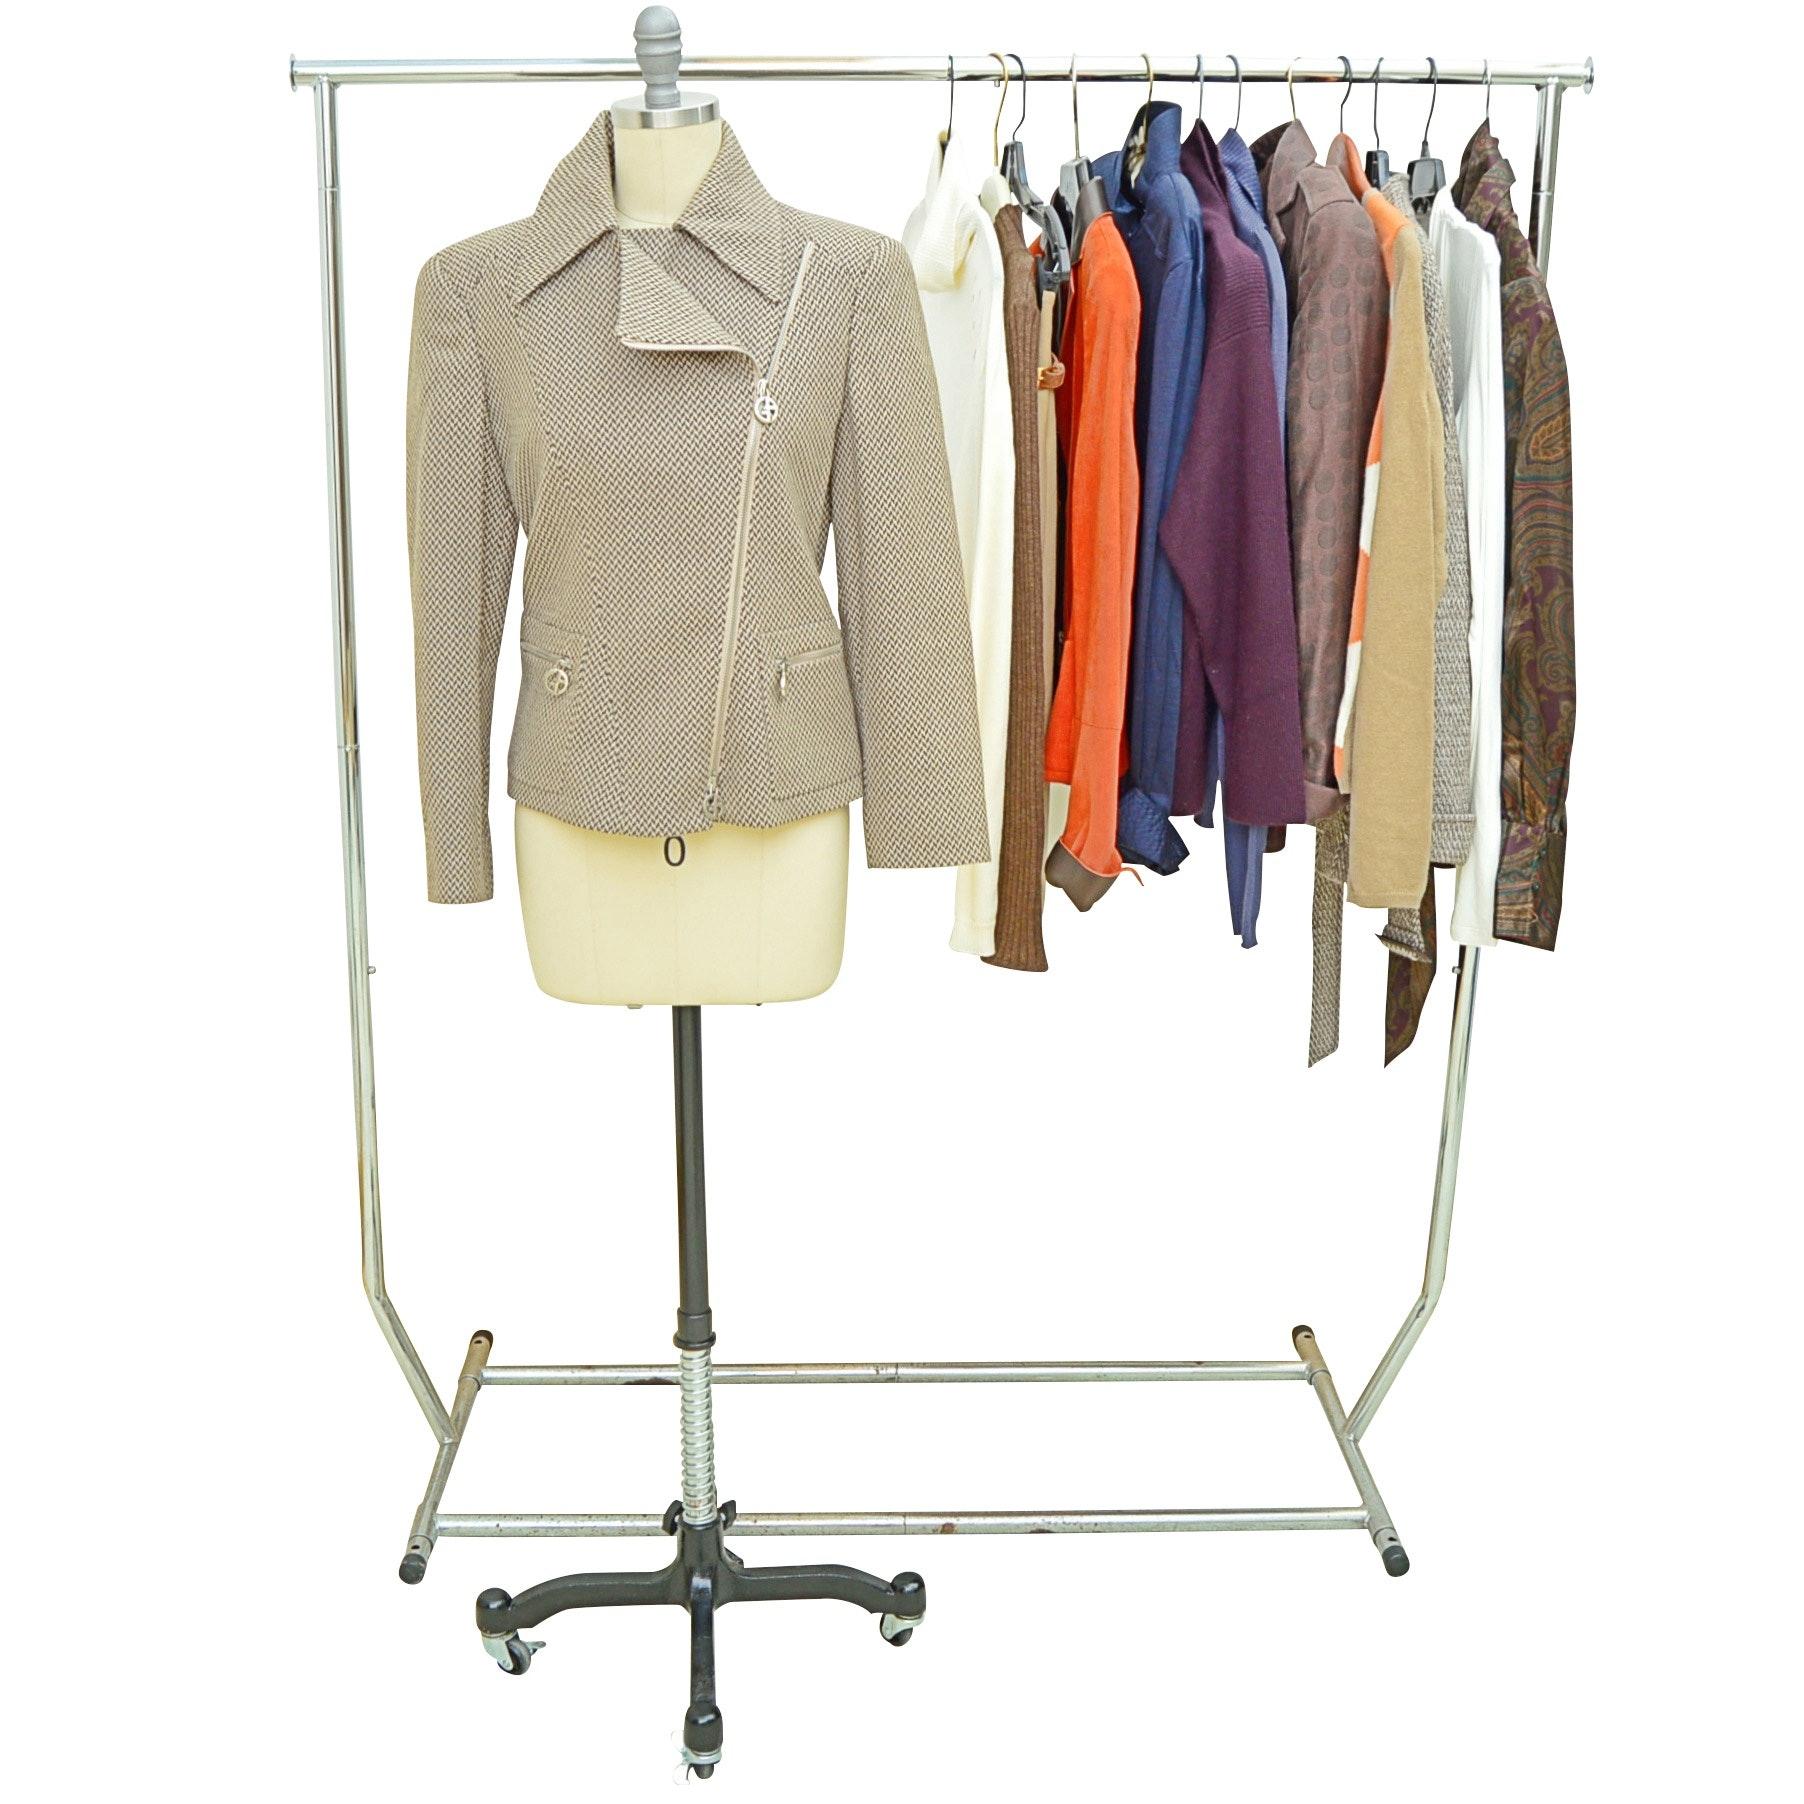 Women's Jackets + Blouses with Armani, Escada, Les Copains, Akris punto, Armani